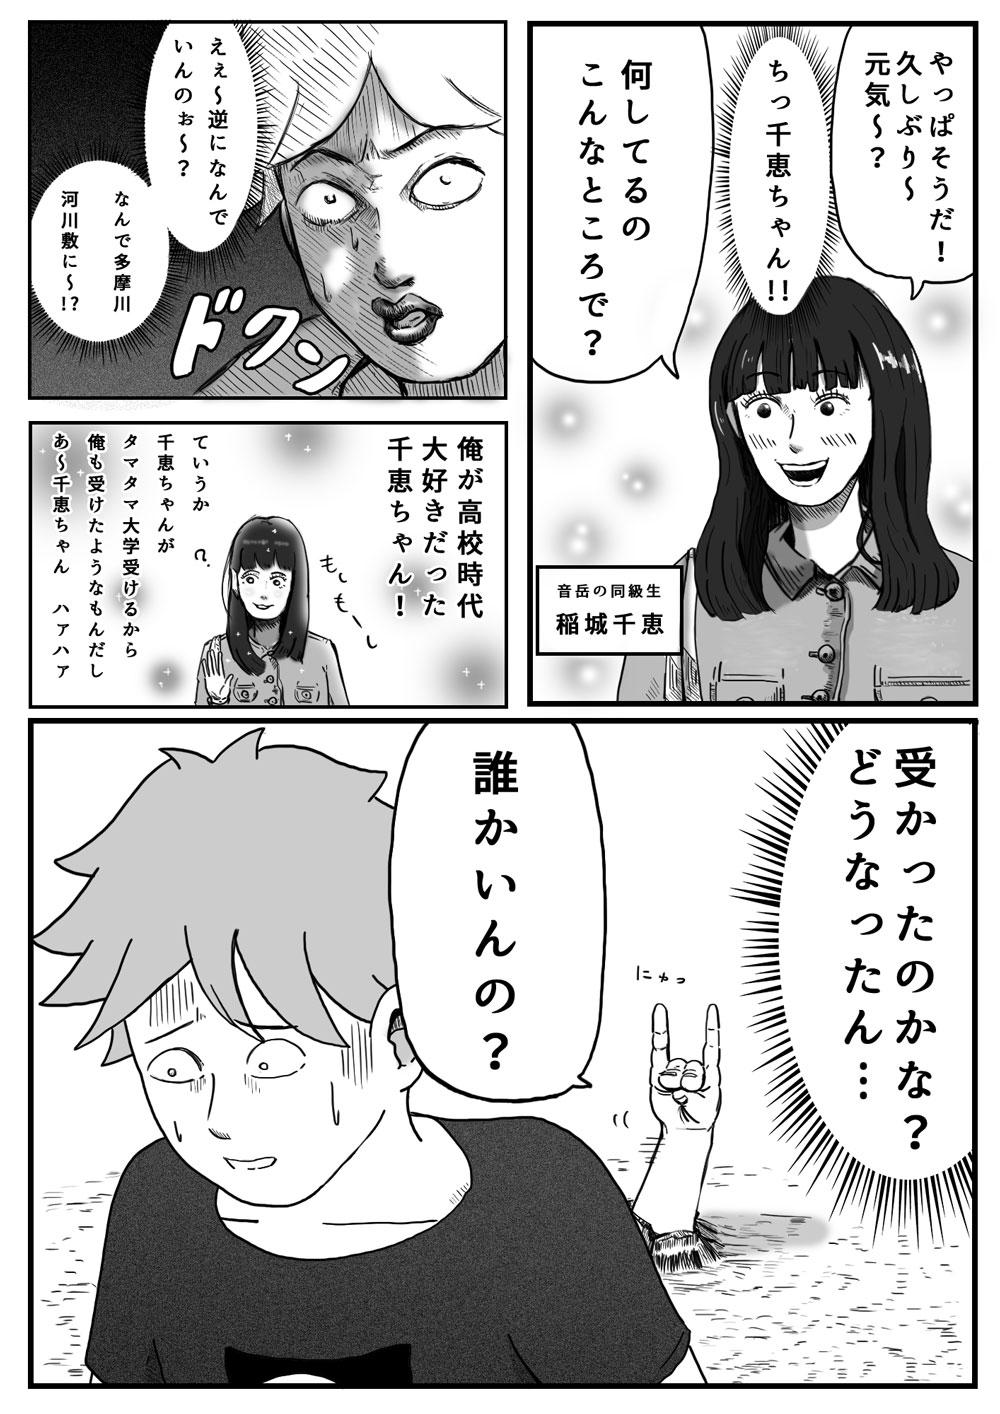 arnolds-hasegawa-005-3